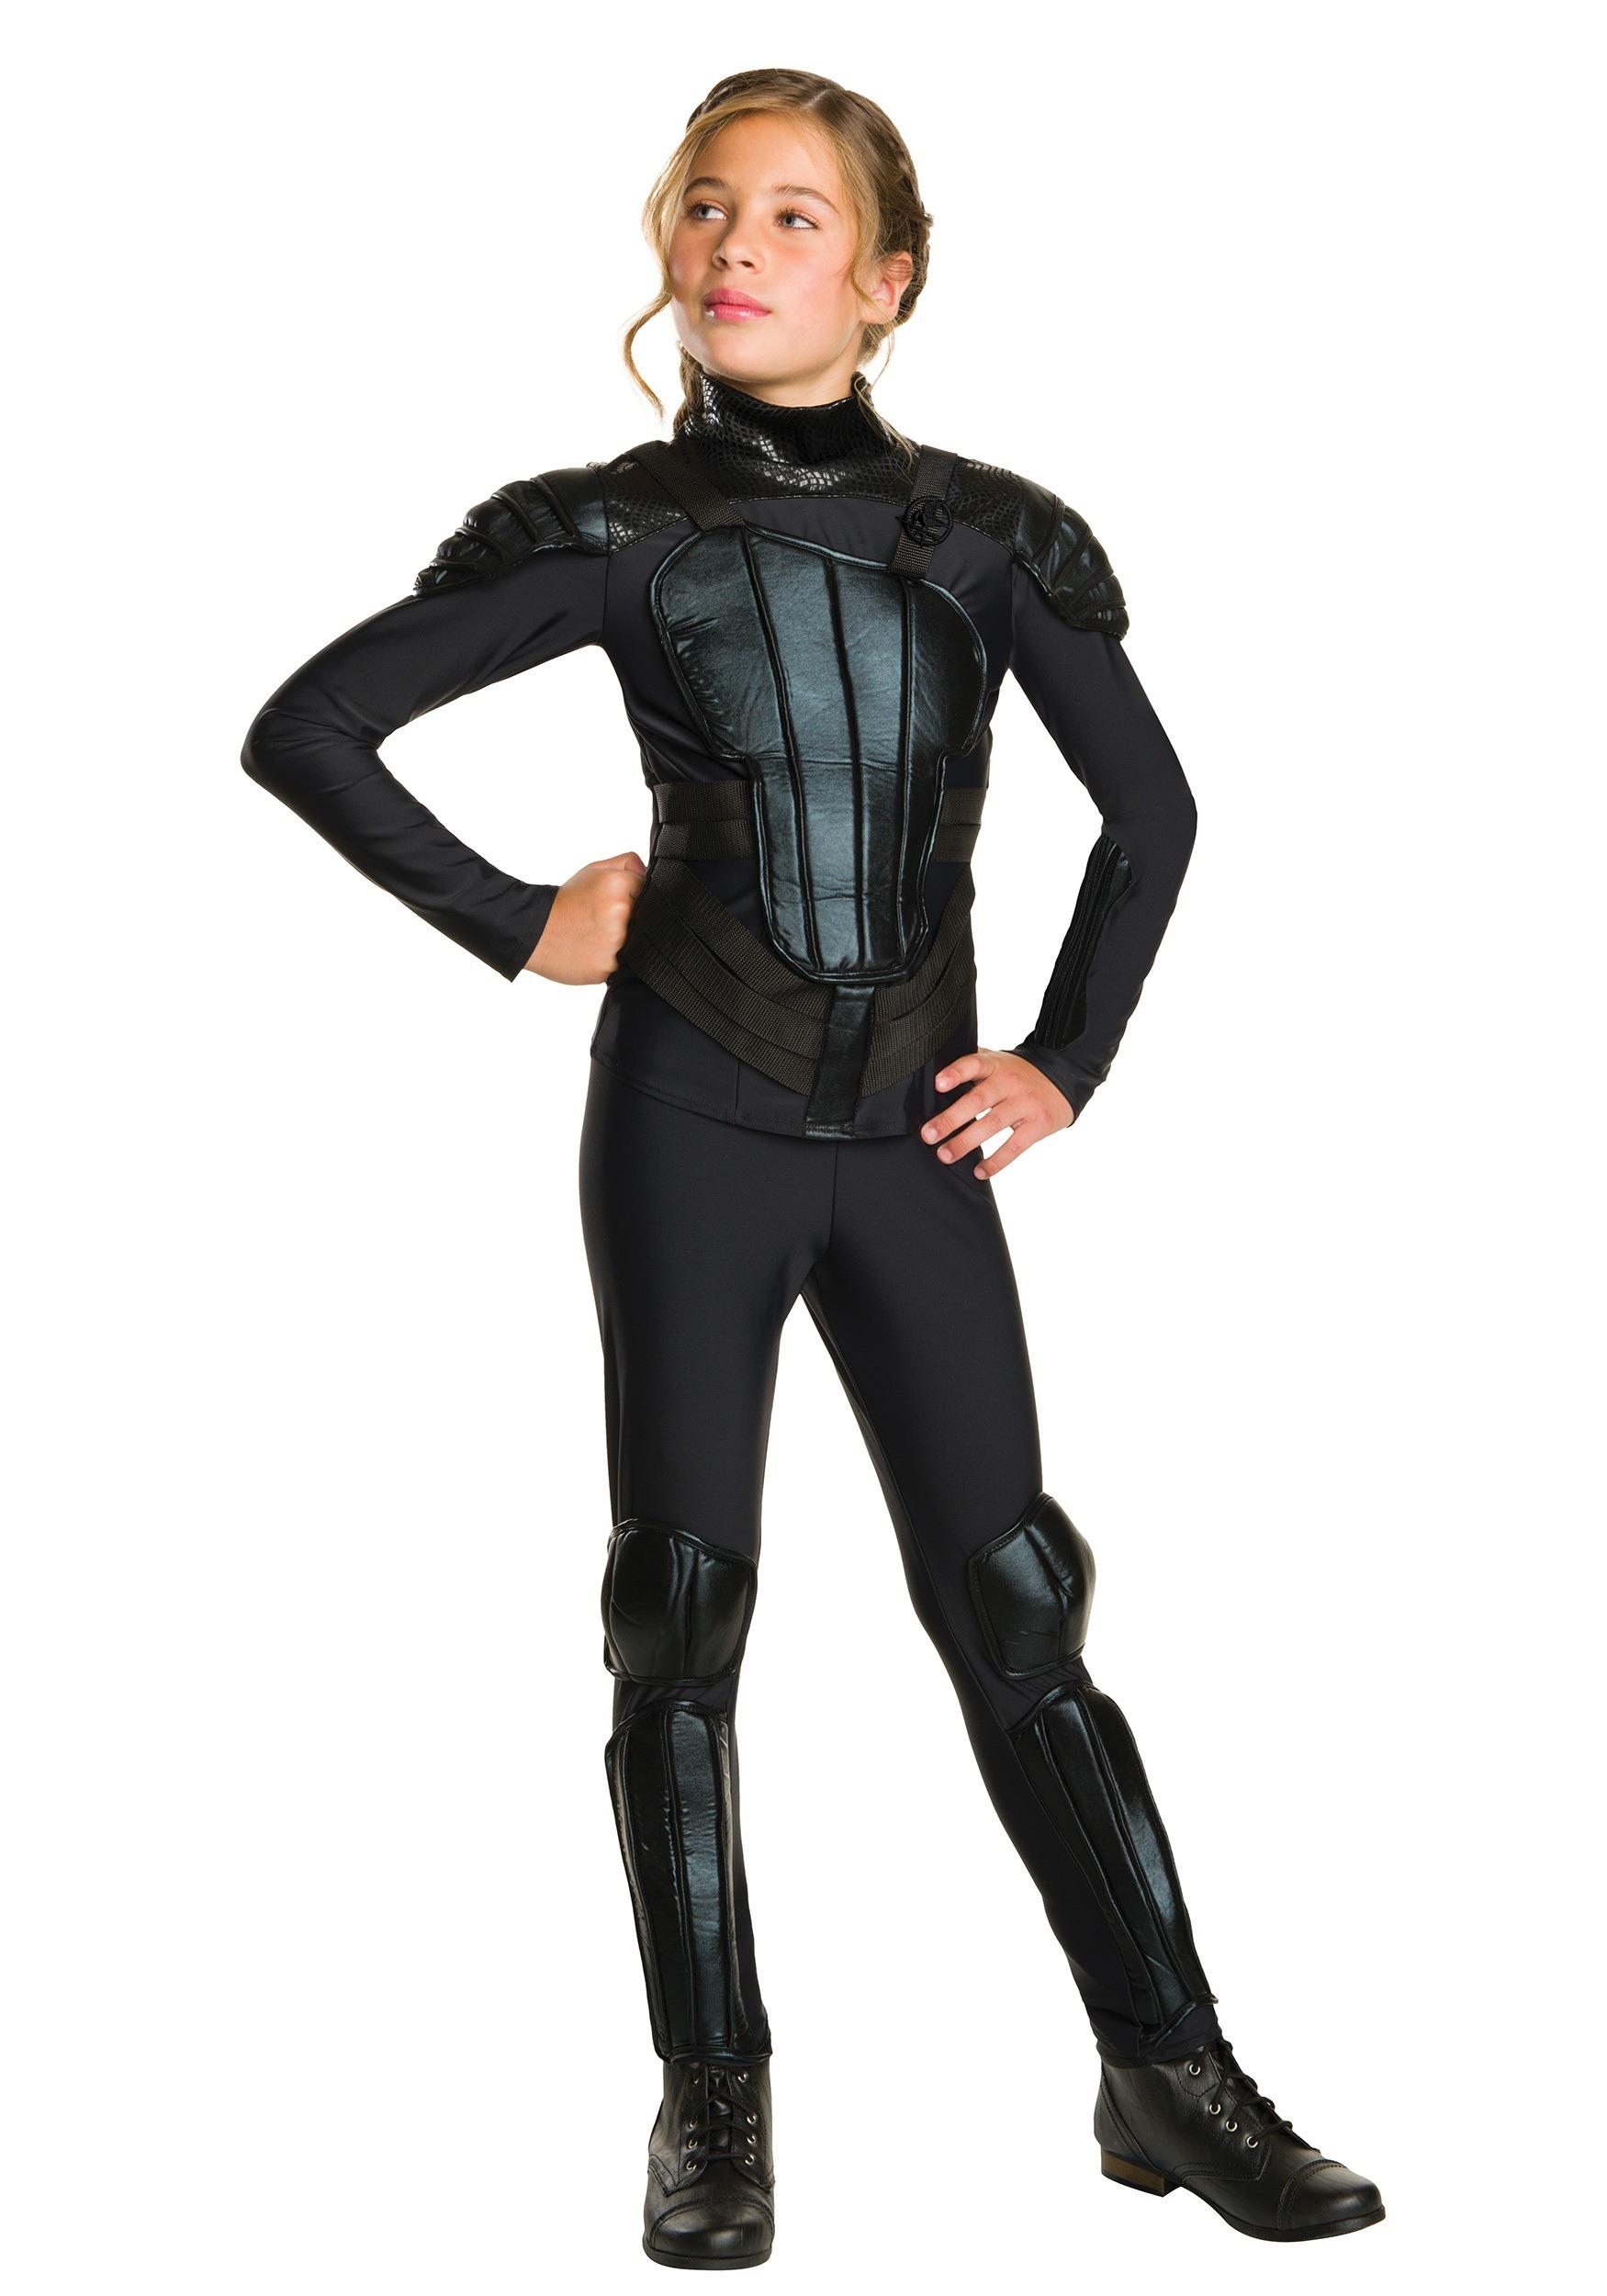 Halloween Costumes for Teens & Tweens - HalloweenCostumes.com